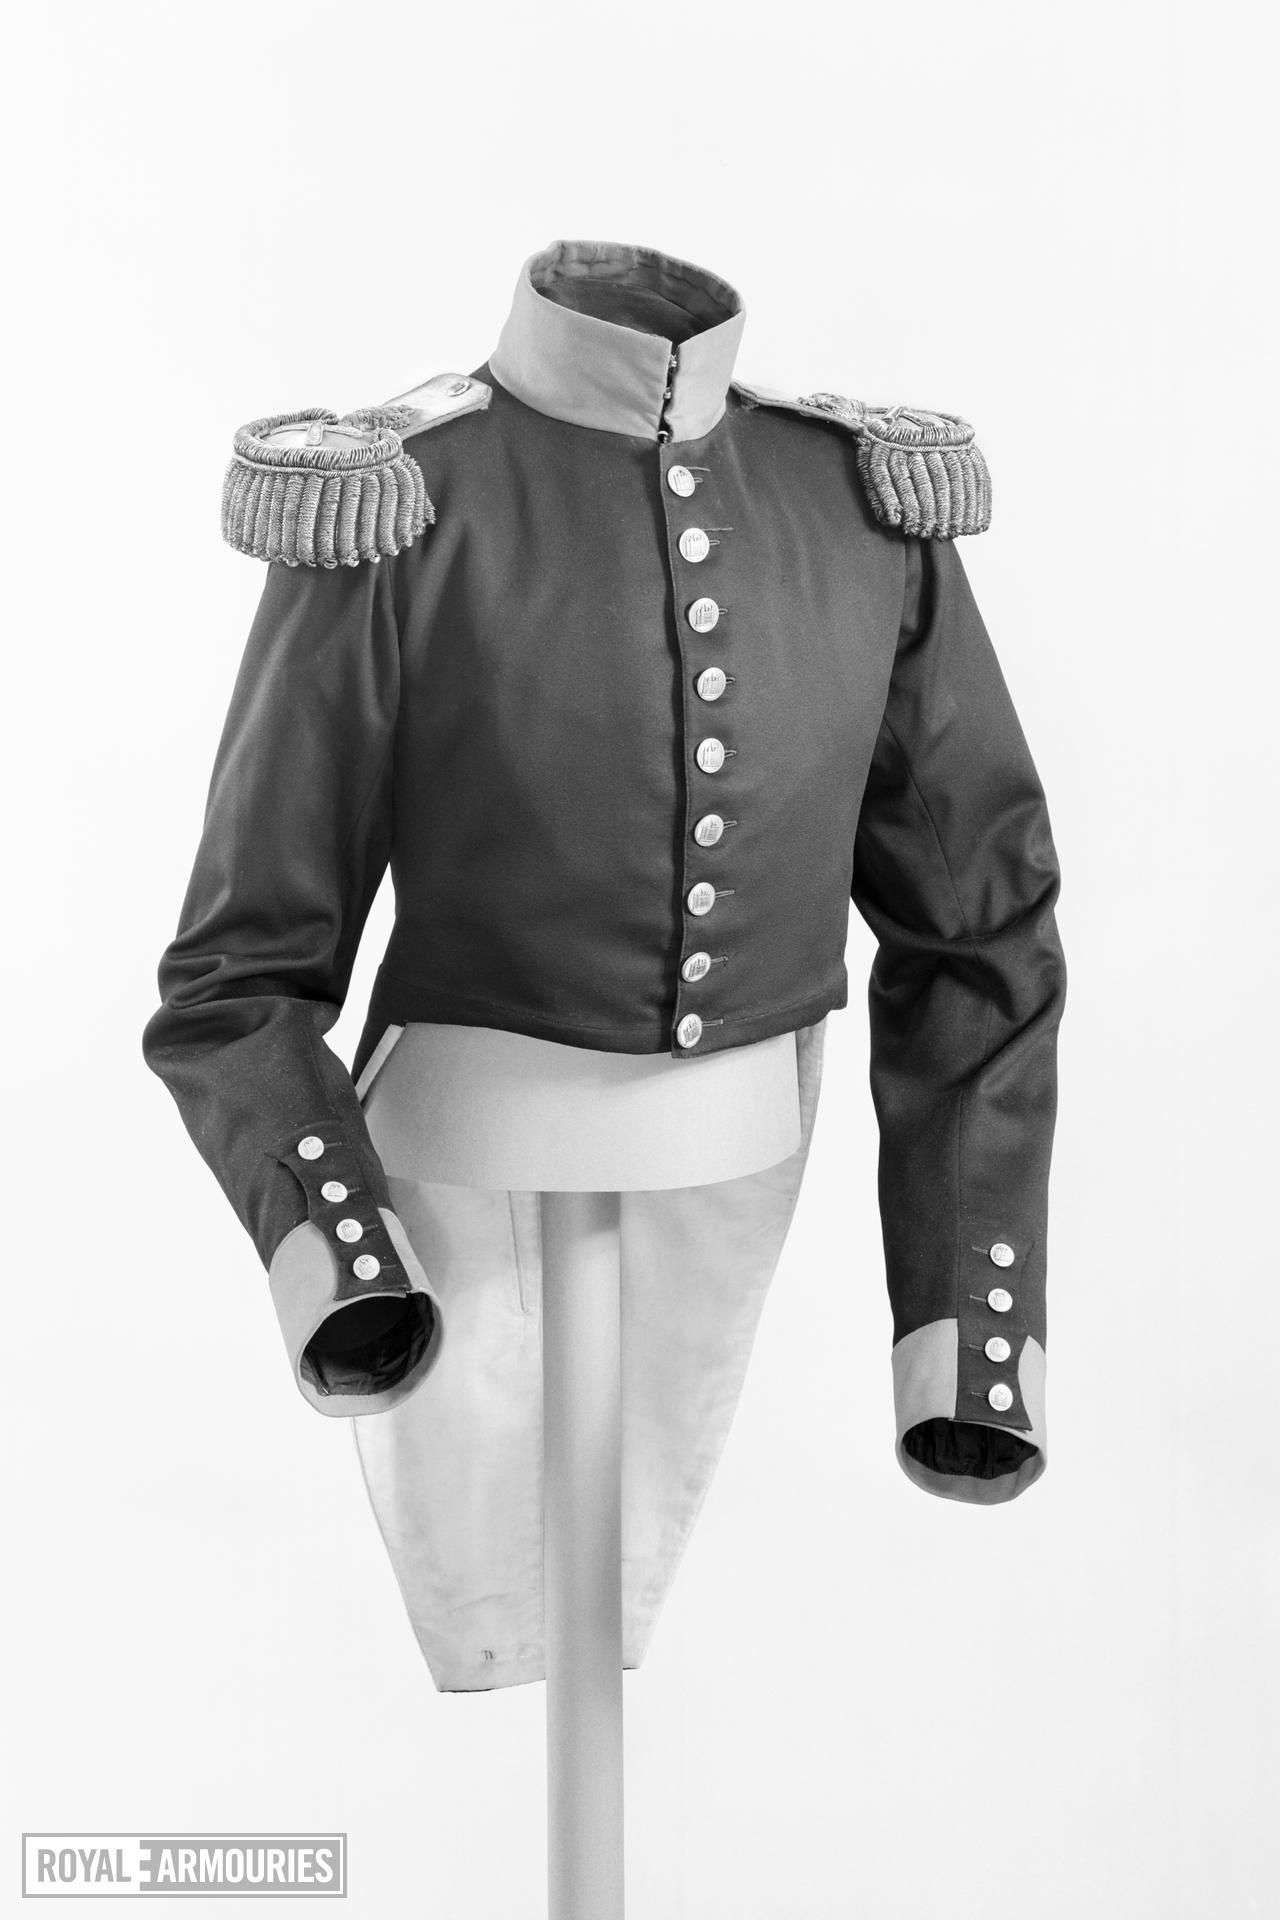 Uniform coat Of the Duke of Wellington